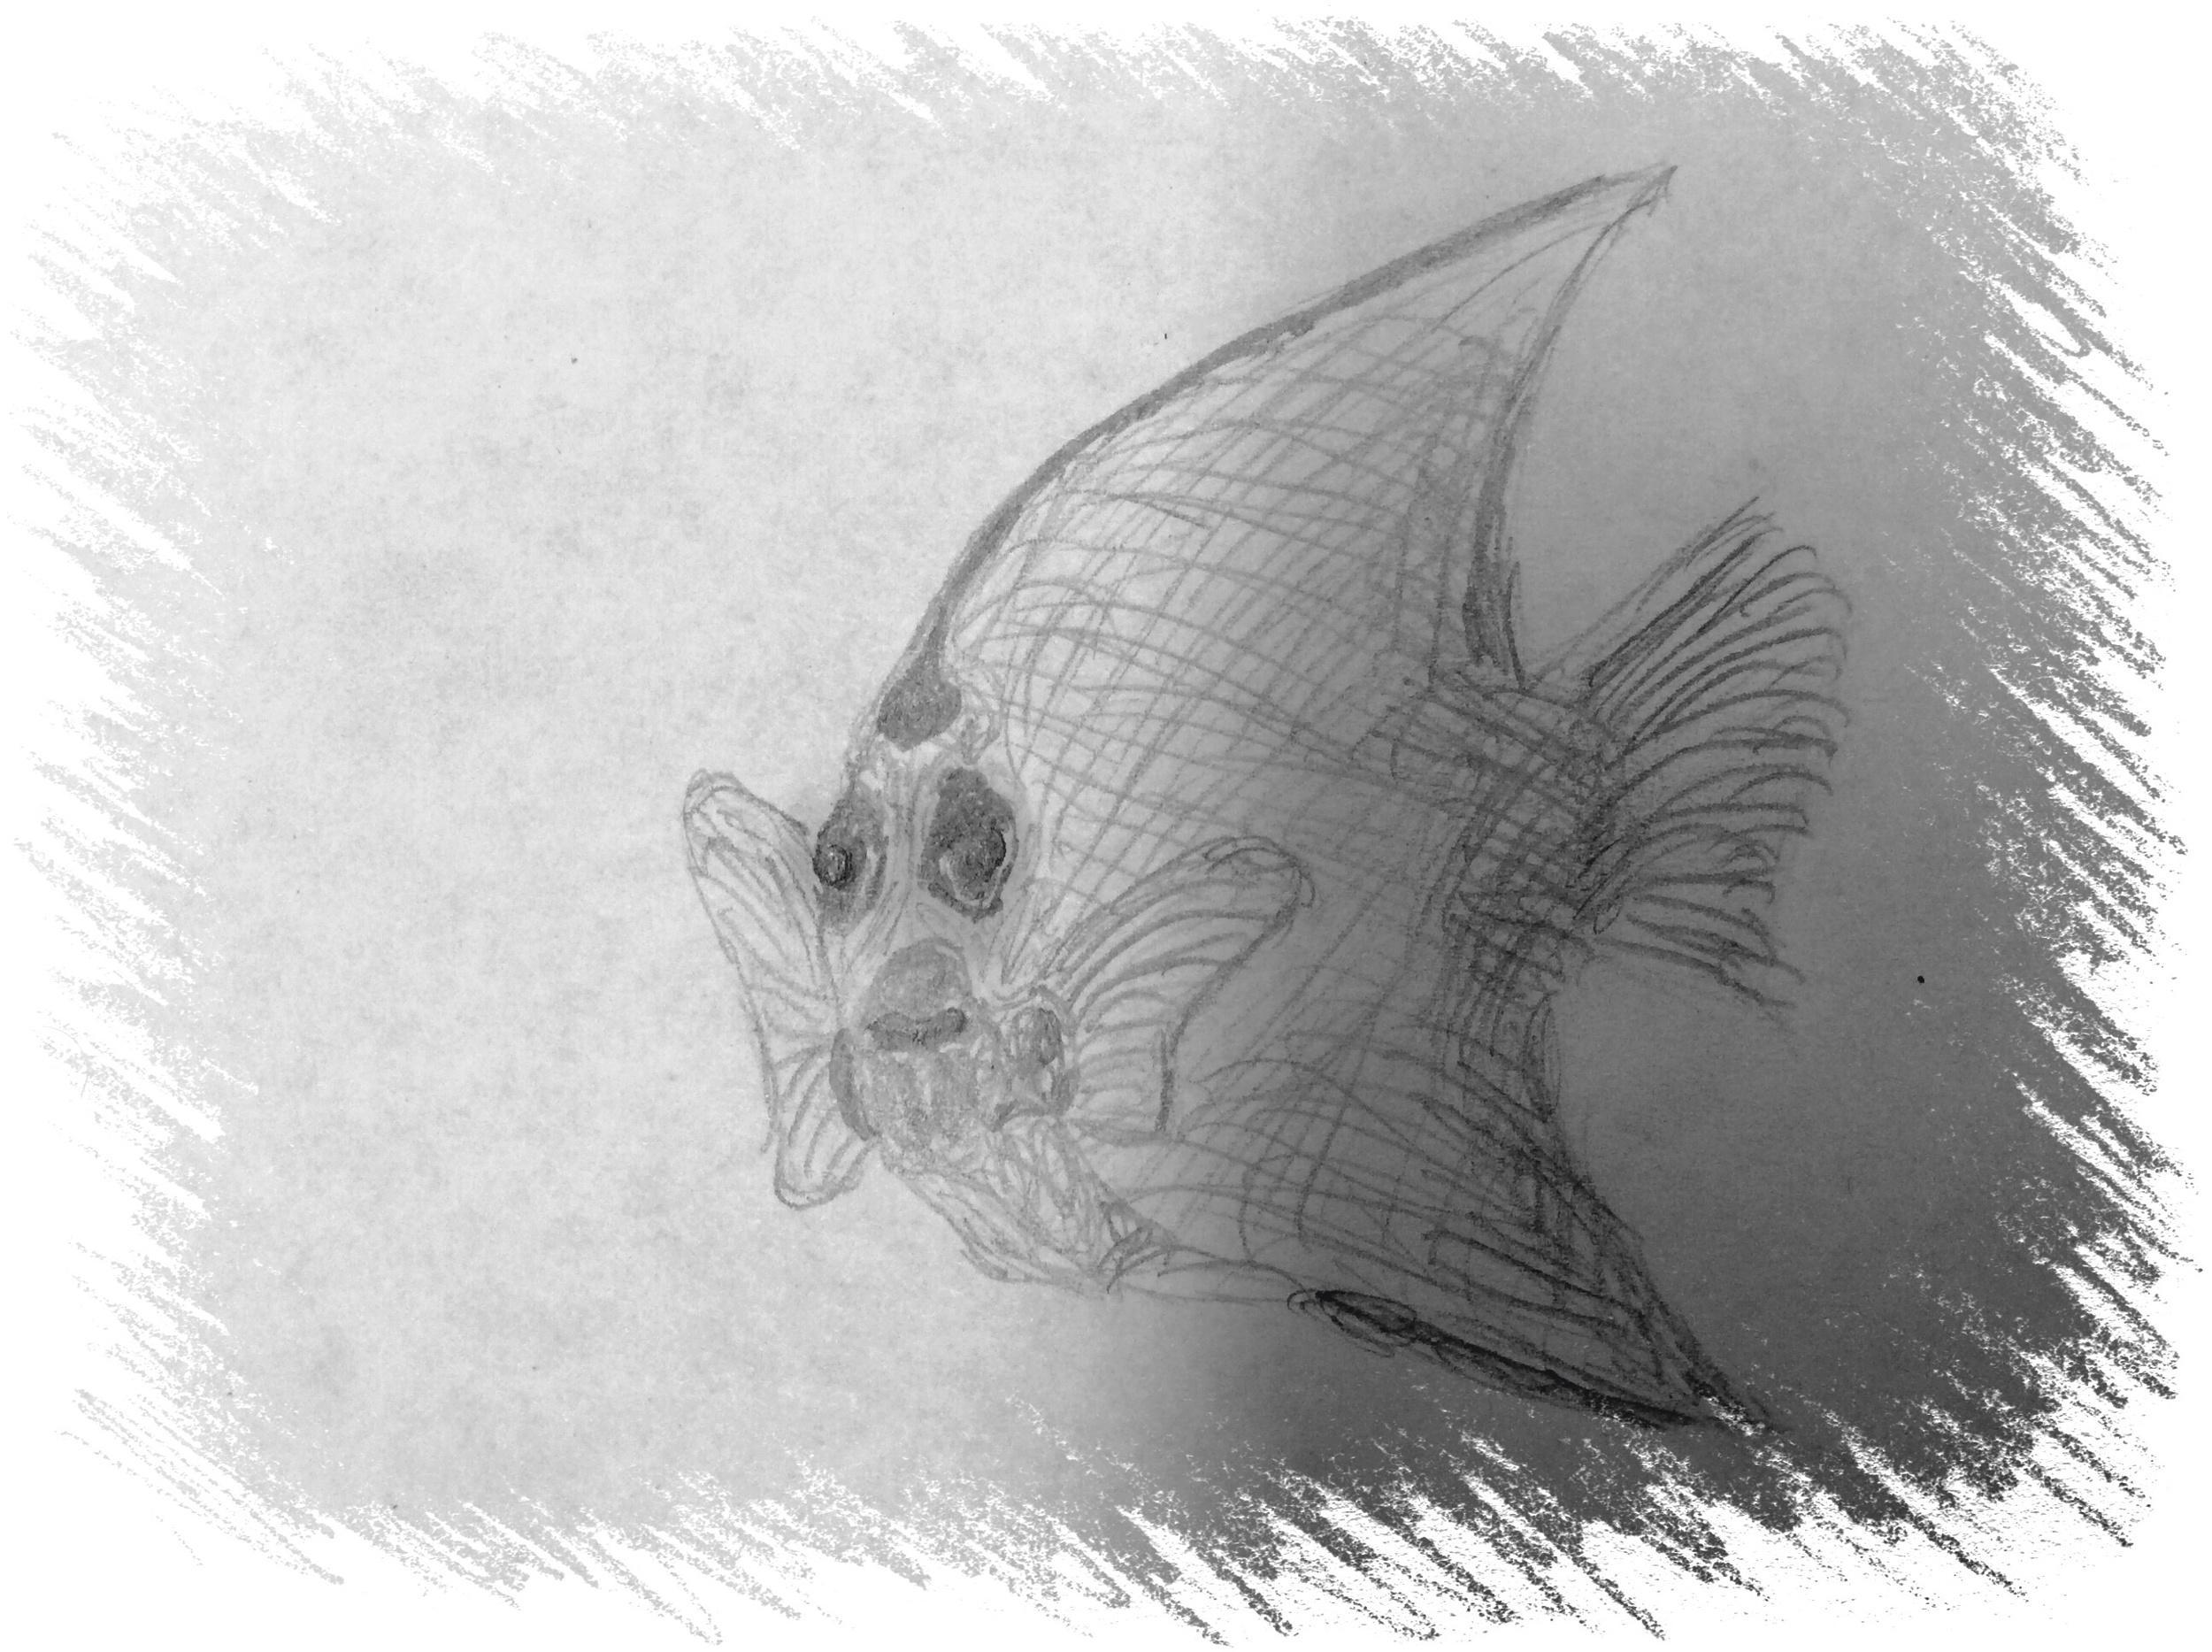 Theme: Fish | Title: Angelfish Drawing